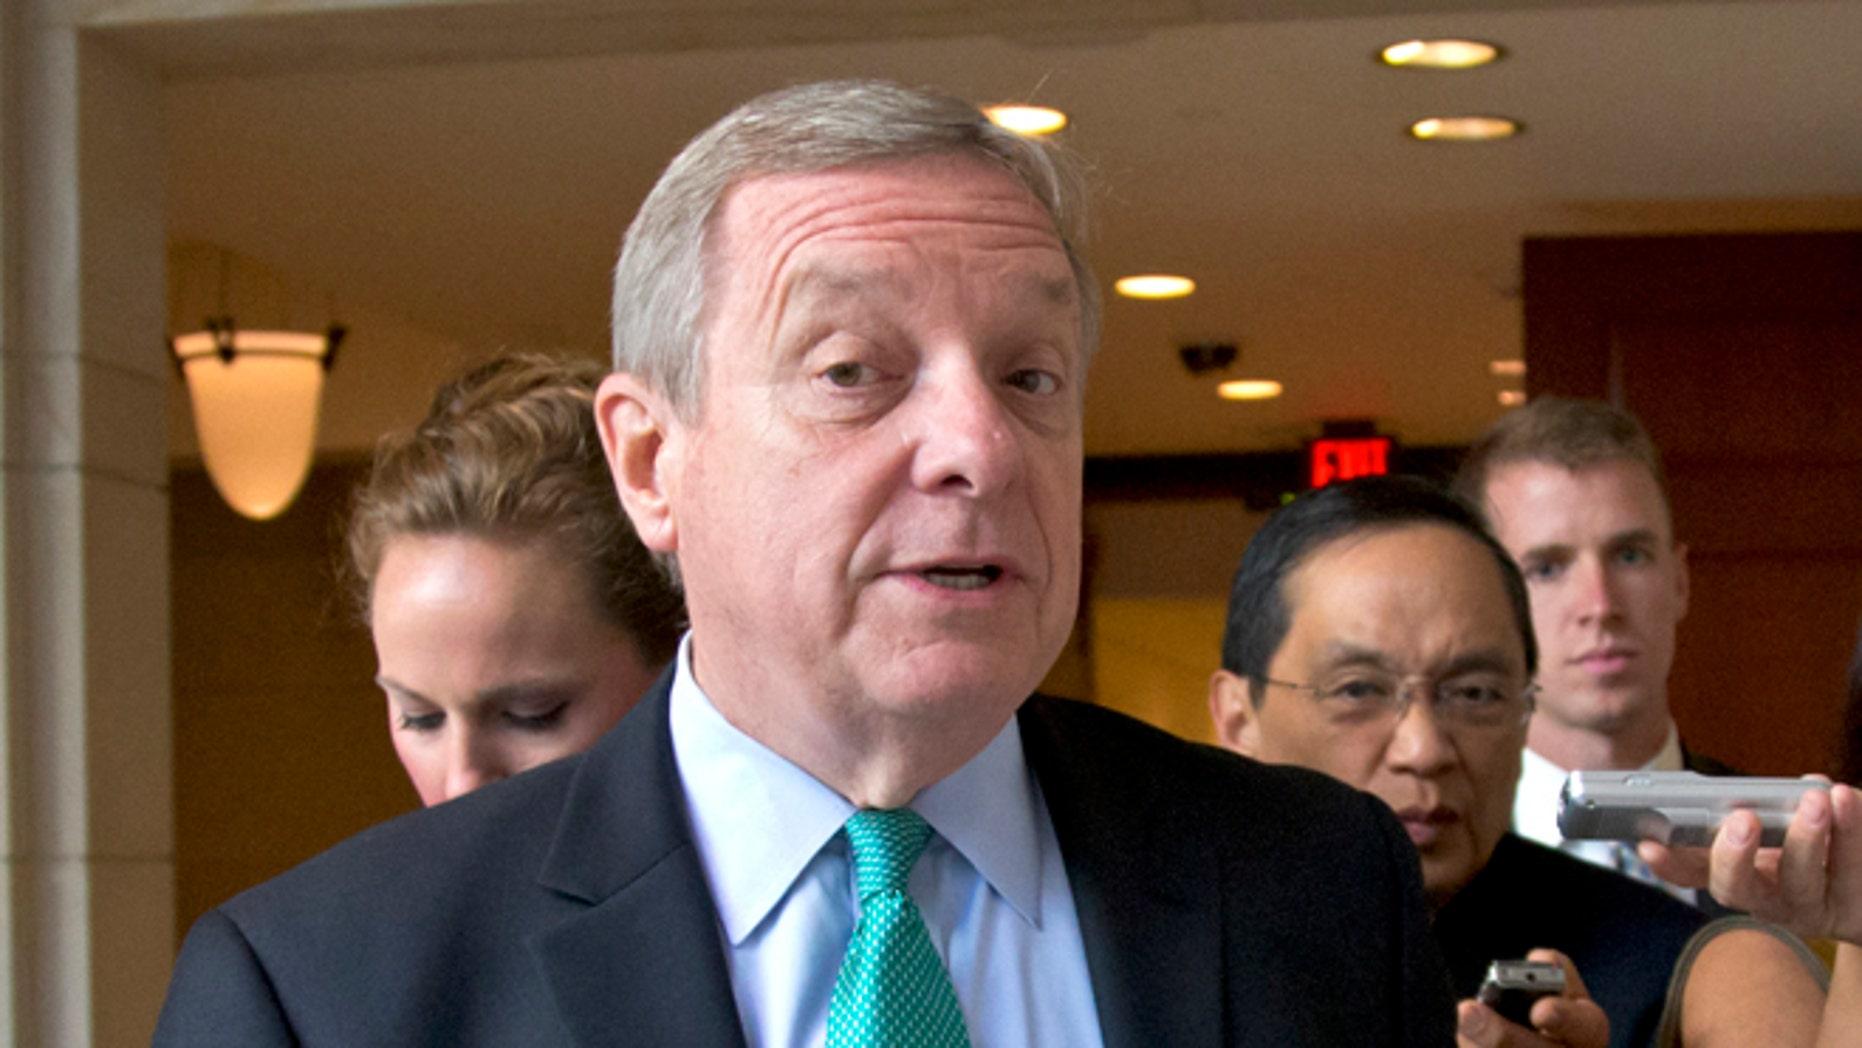 FILE: Sept. 4, 2013: Sen. Dick Durbin, D-Ill., walks at the Capitol in Washington, D.C.